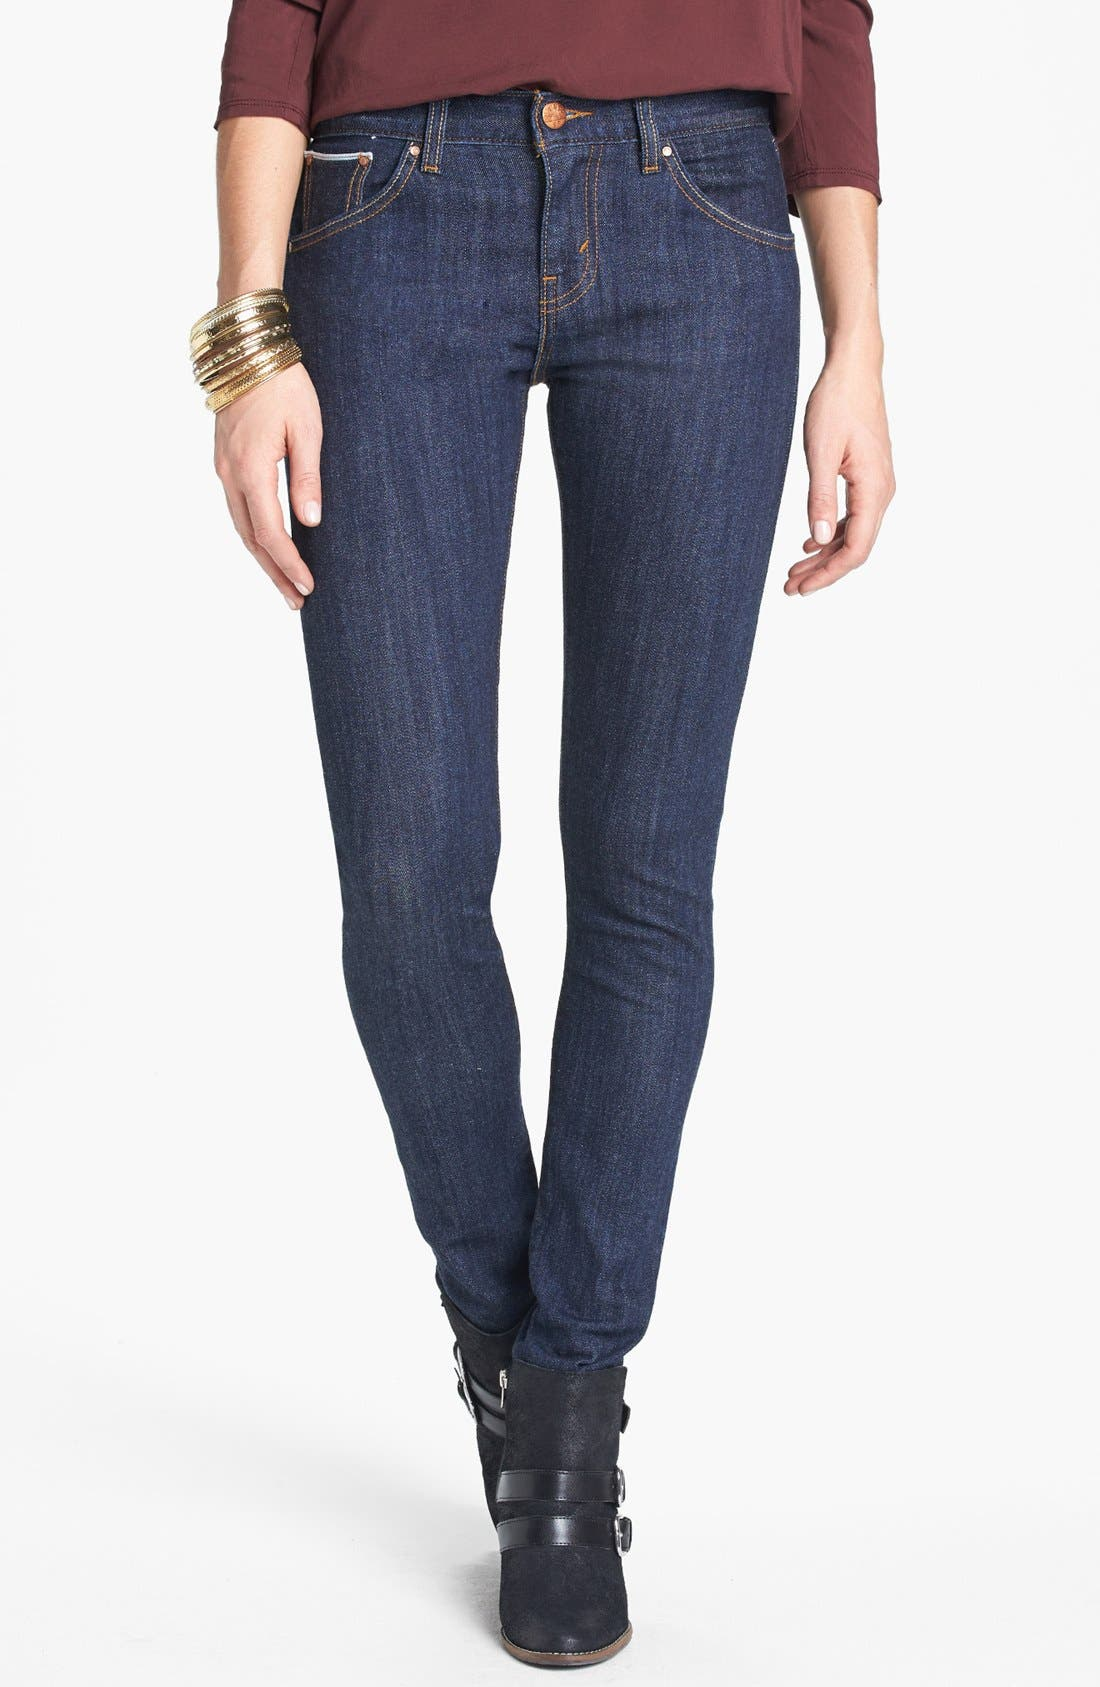 Main Image - Levi's® High Waist Resin Rinse Selvedge Skinny Jeans